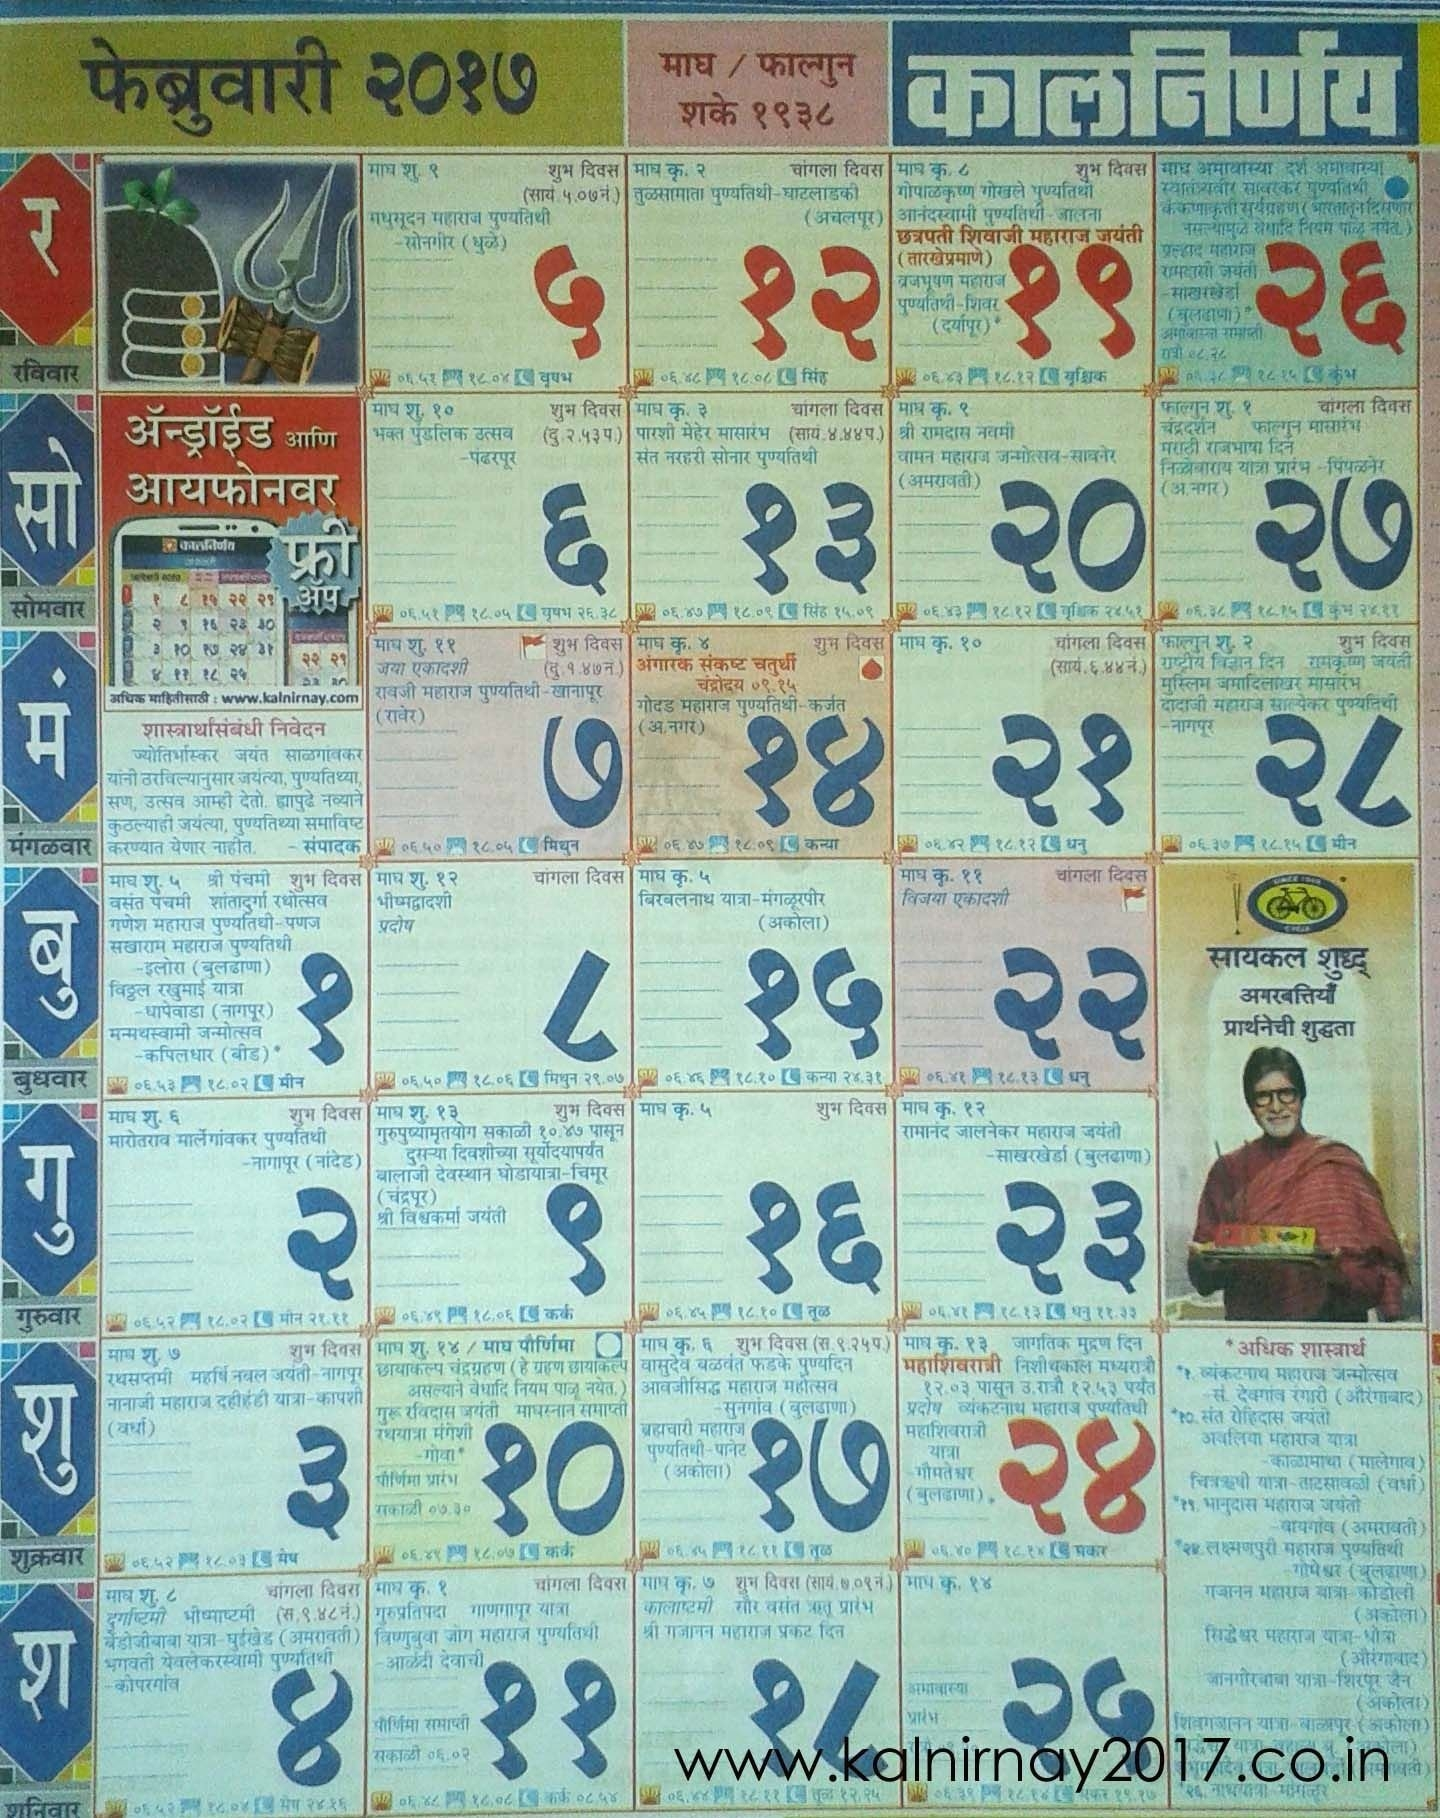 2021 Calendar Kalnirnay Marathi | Printable Calendars 2021 inside 2021 Kalnirnay Marathi Calendar